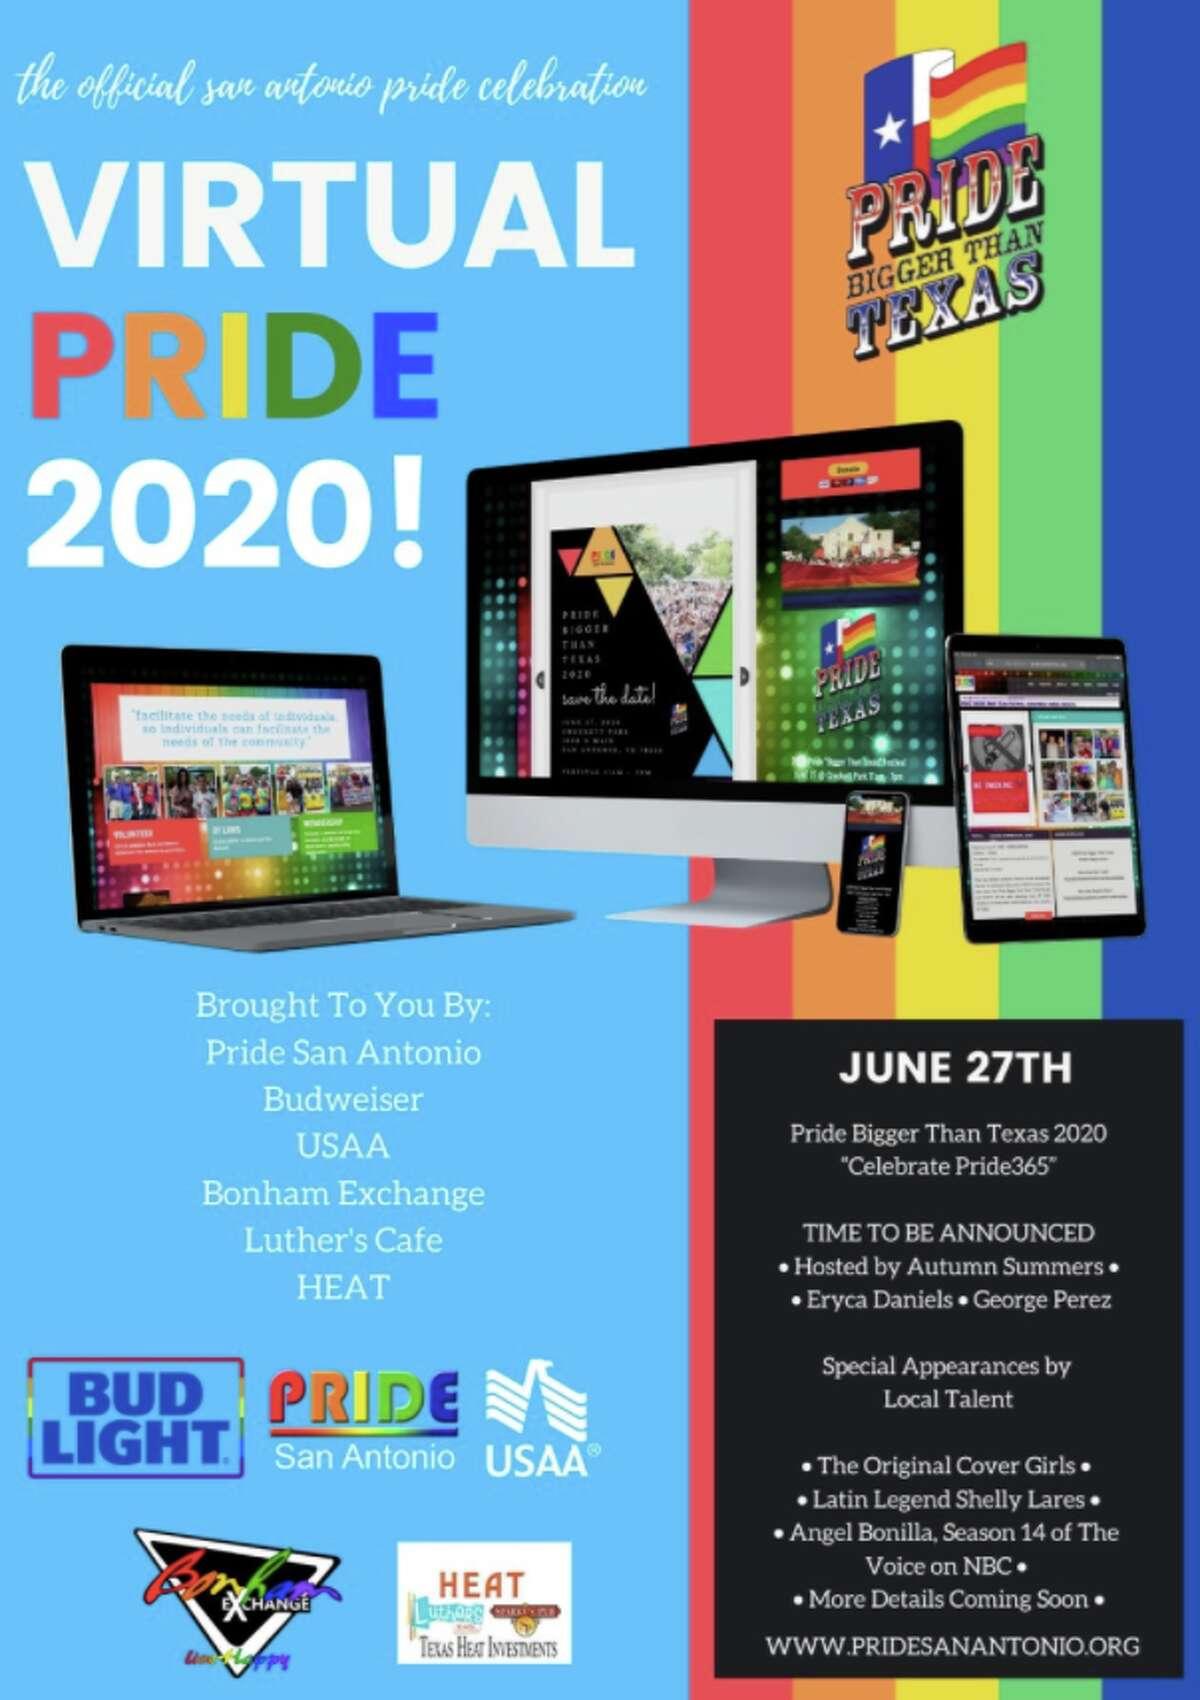 Pride San Antonio announced Friday that the annual Pride Bigger Than Texas celebration will move to a virtual platform amid the coronavirus pandemic.